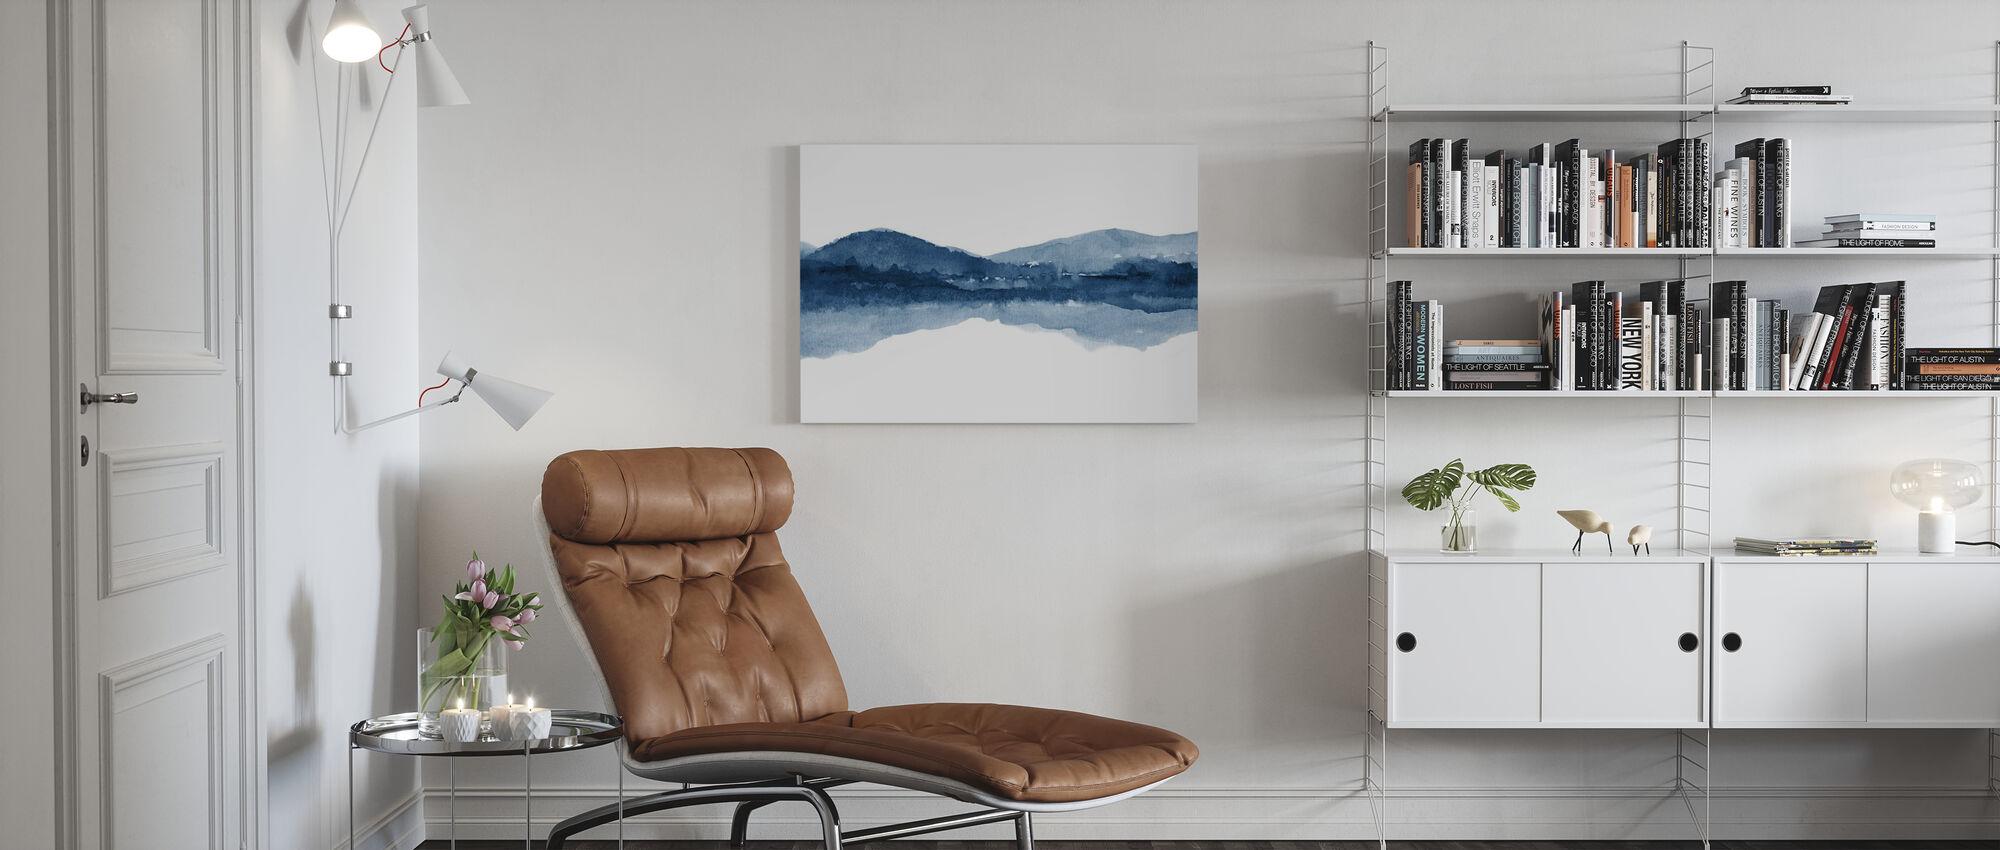 Watercolor Landscape I - Navy Blue - Canvas print - Living Room